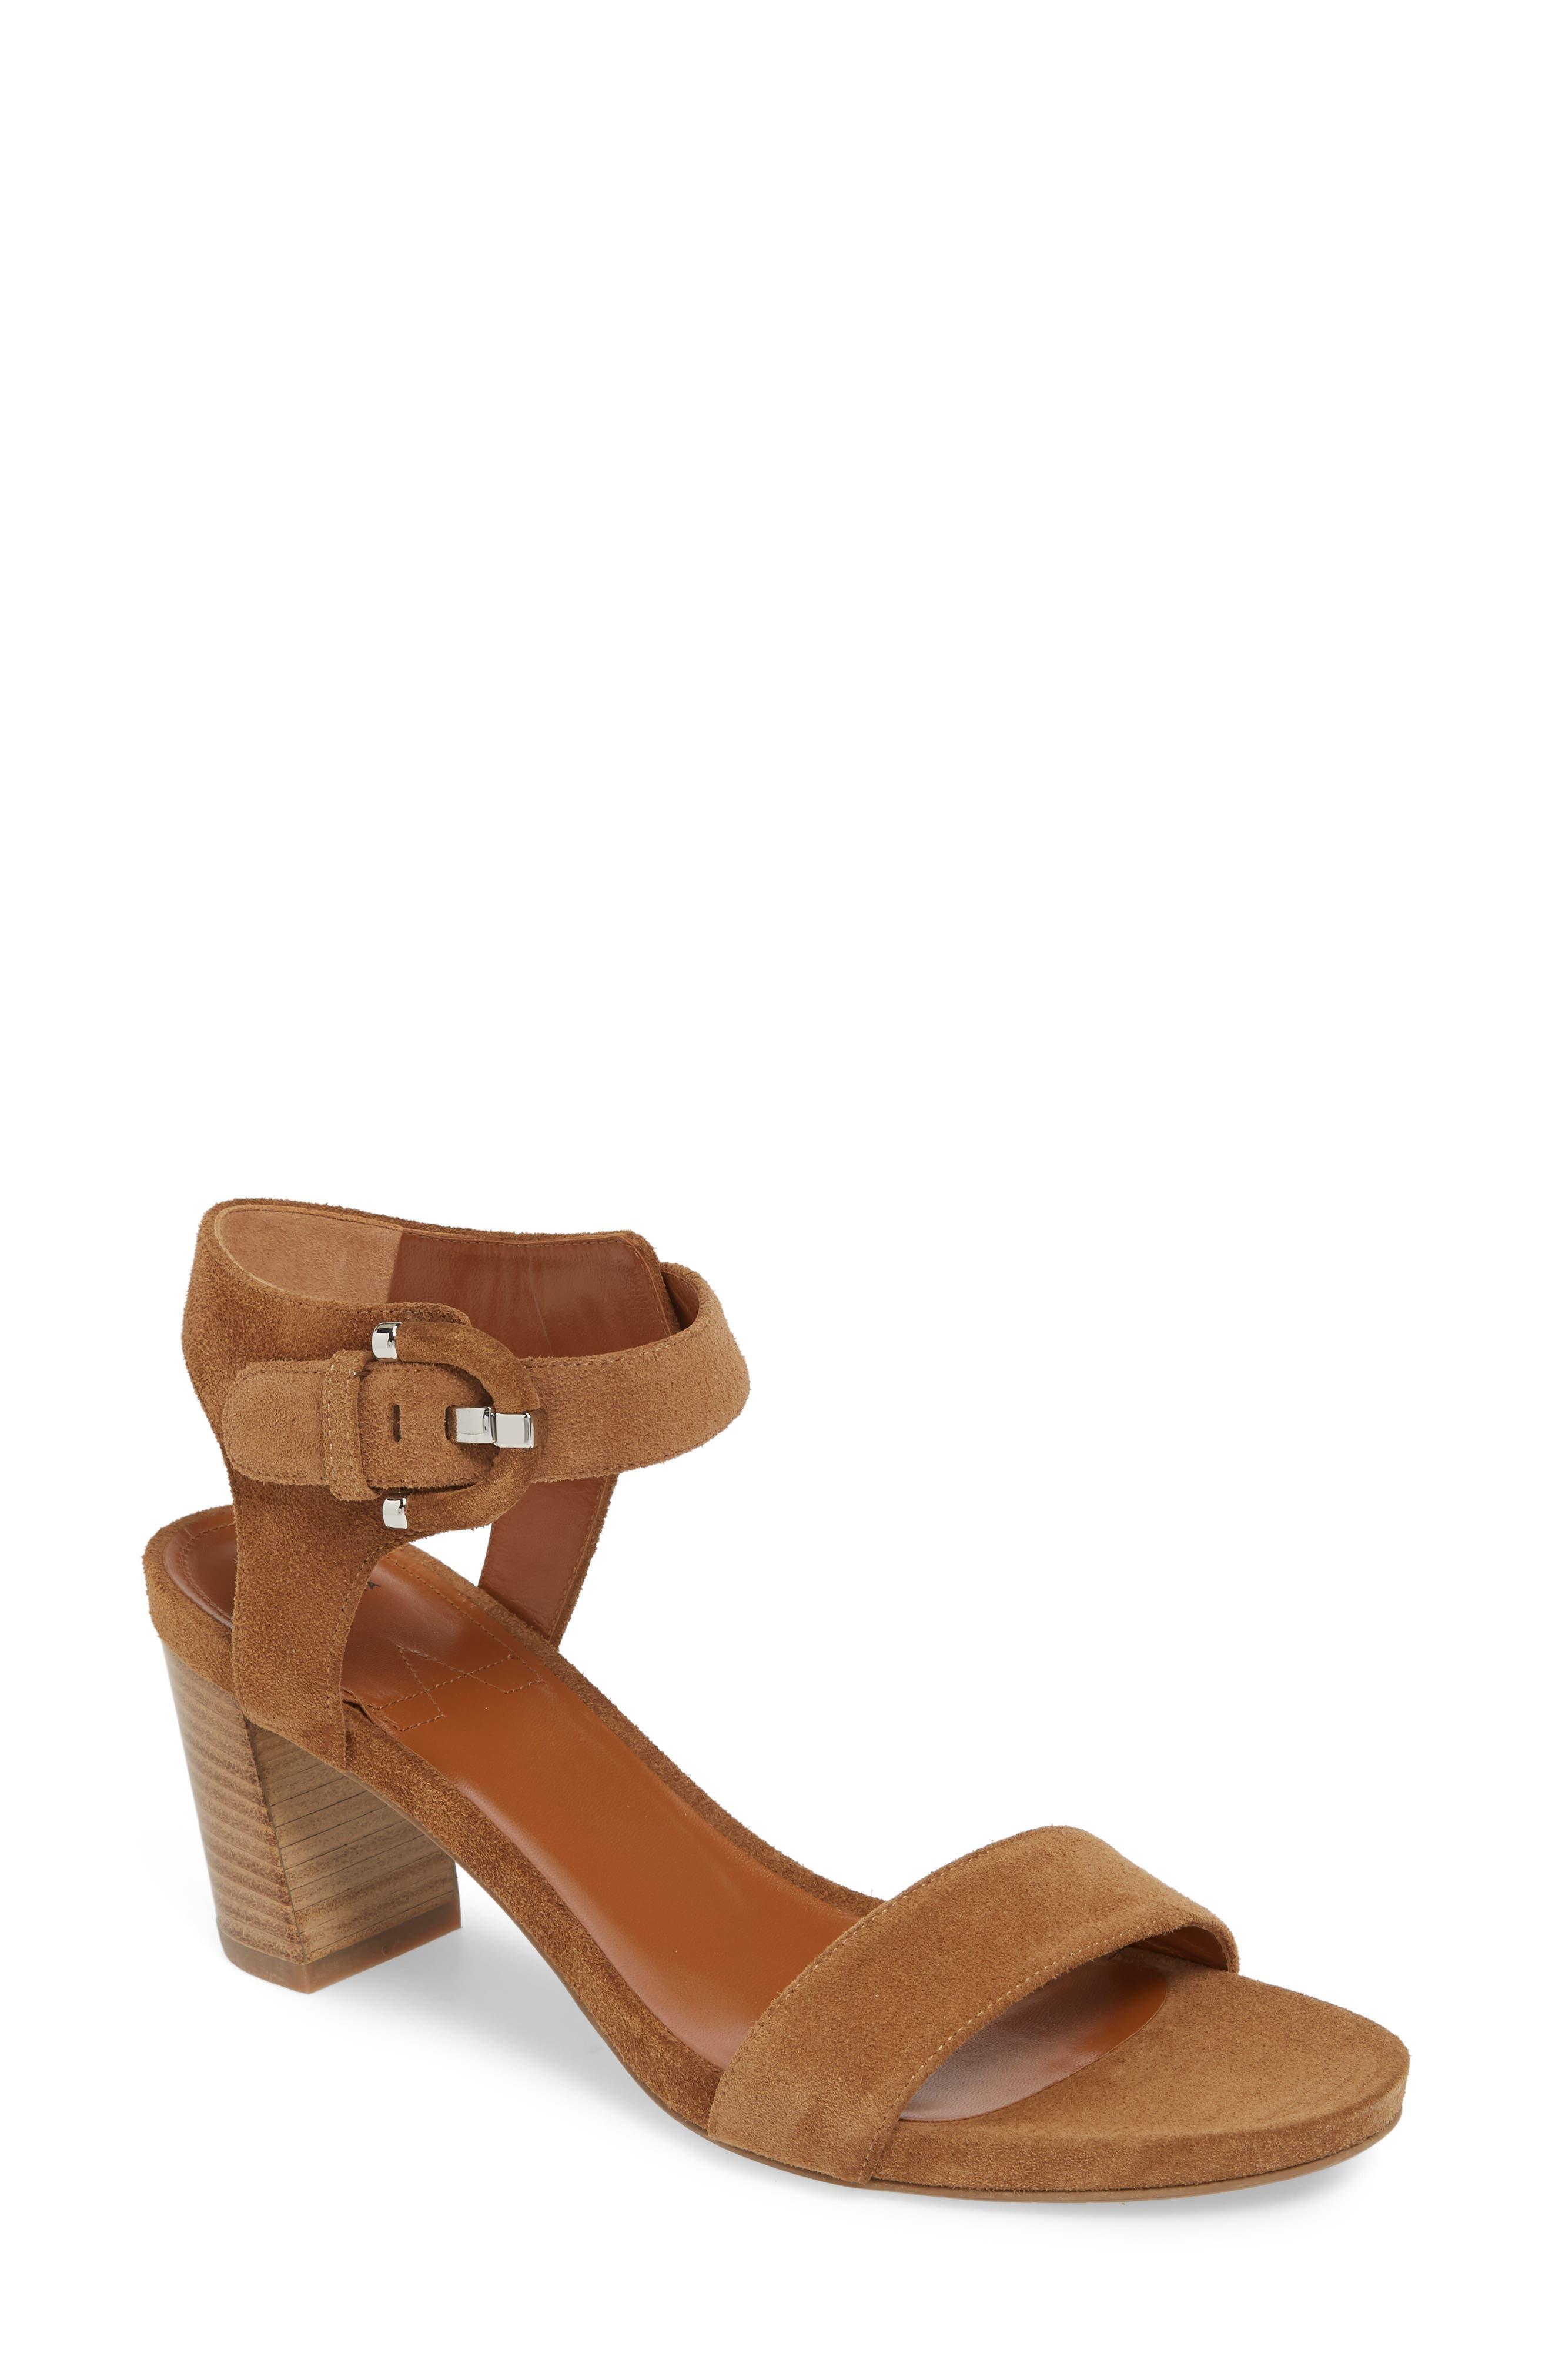 Aquatalia Breanna Ankle Strap Sandal- Brown